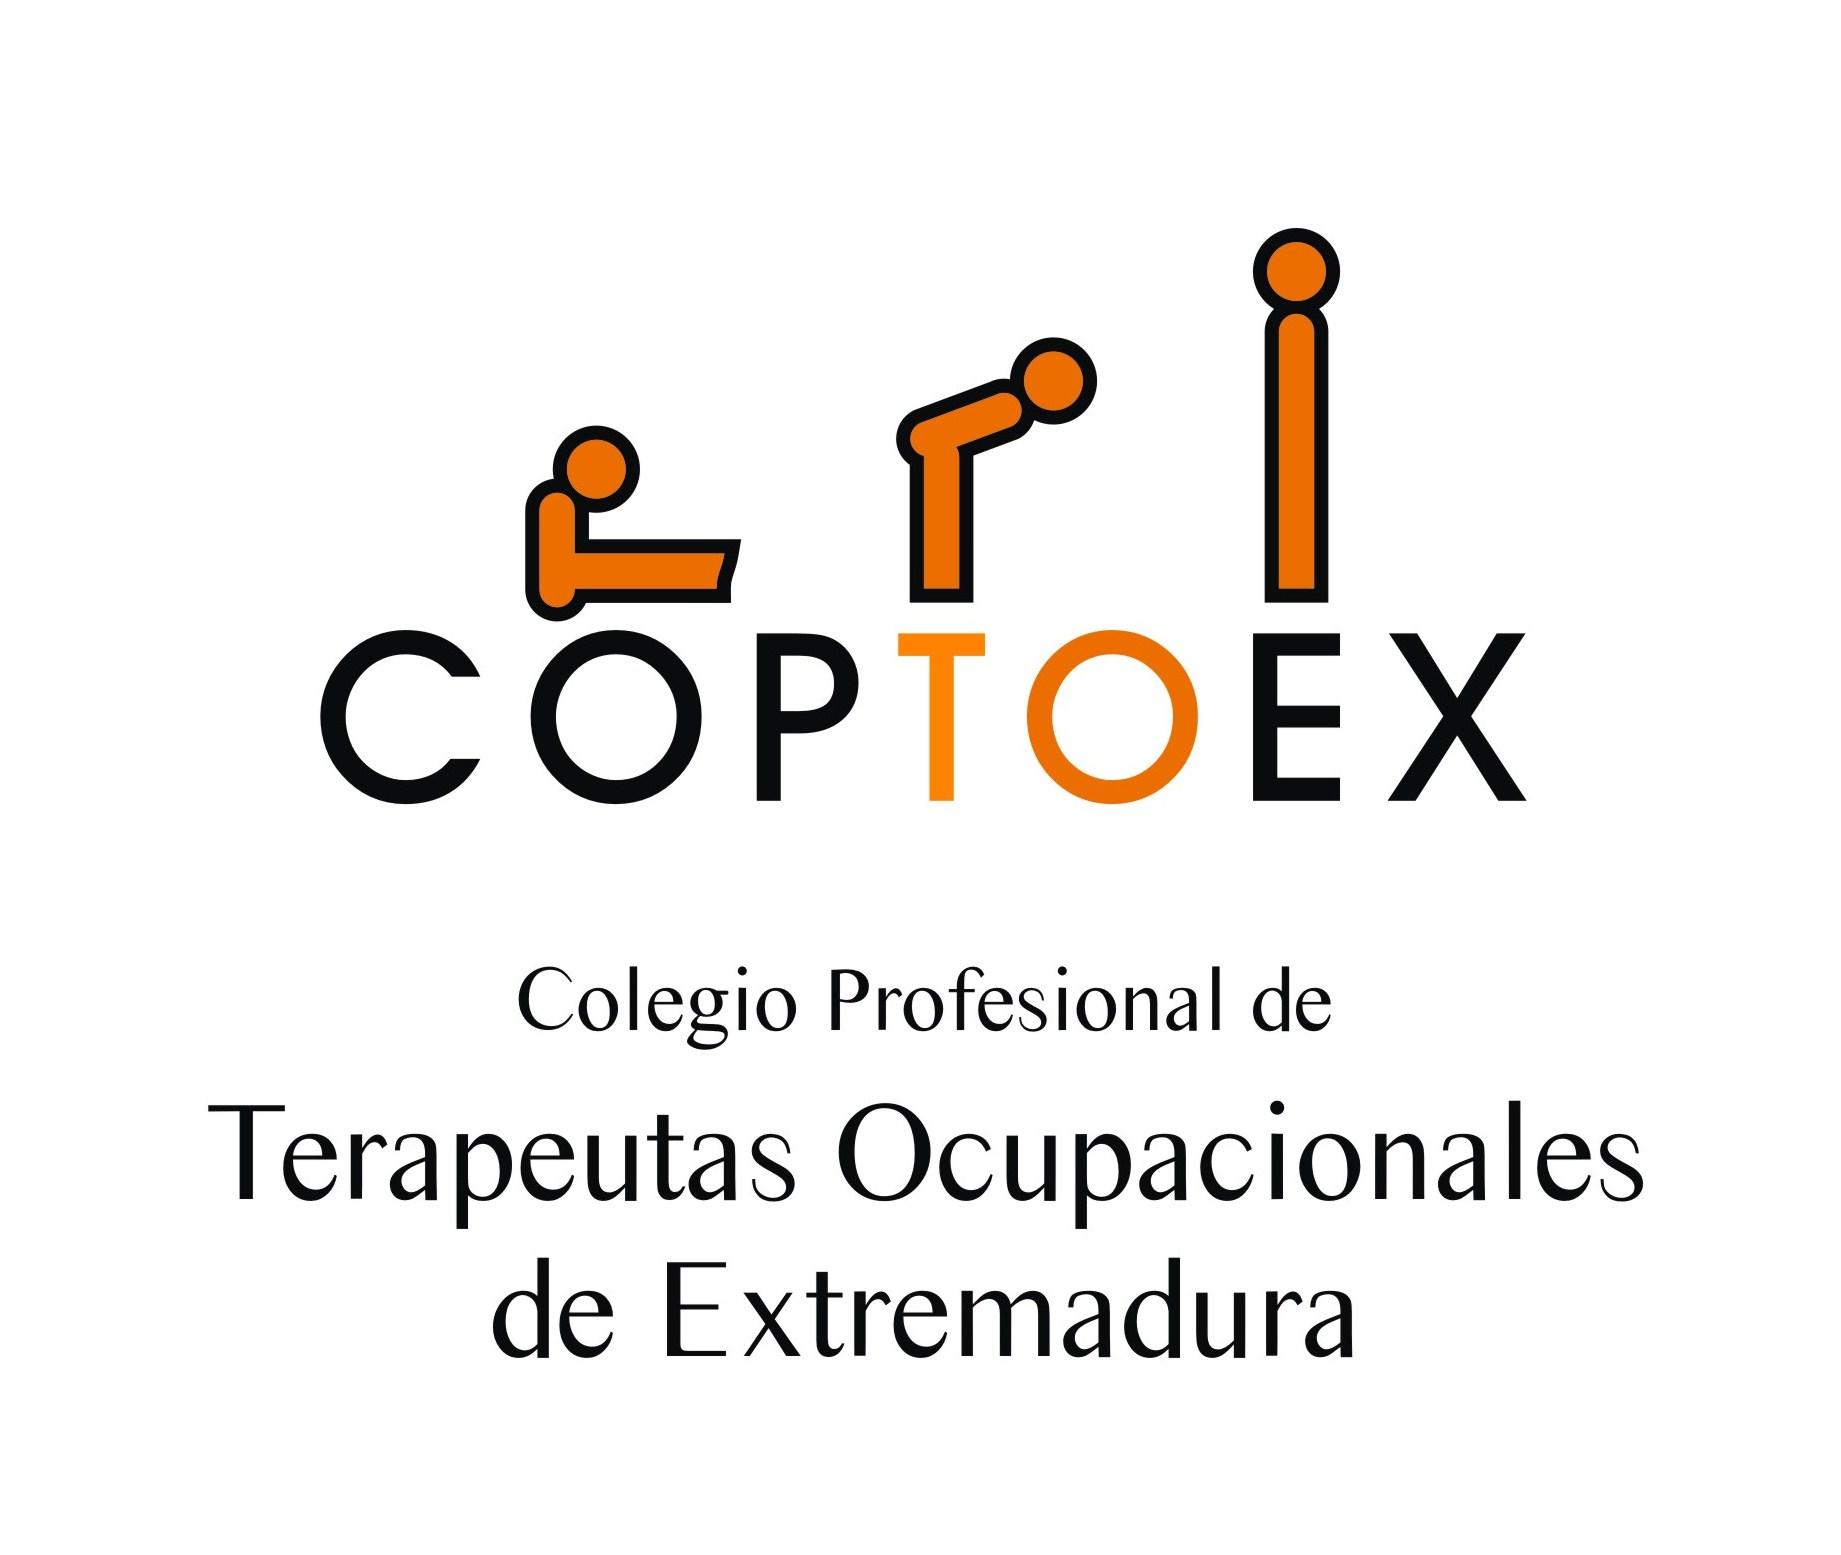 coptoex